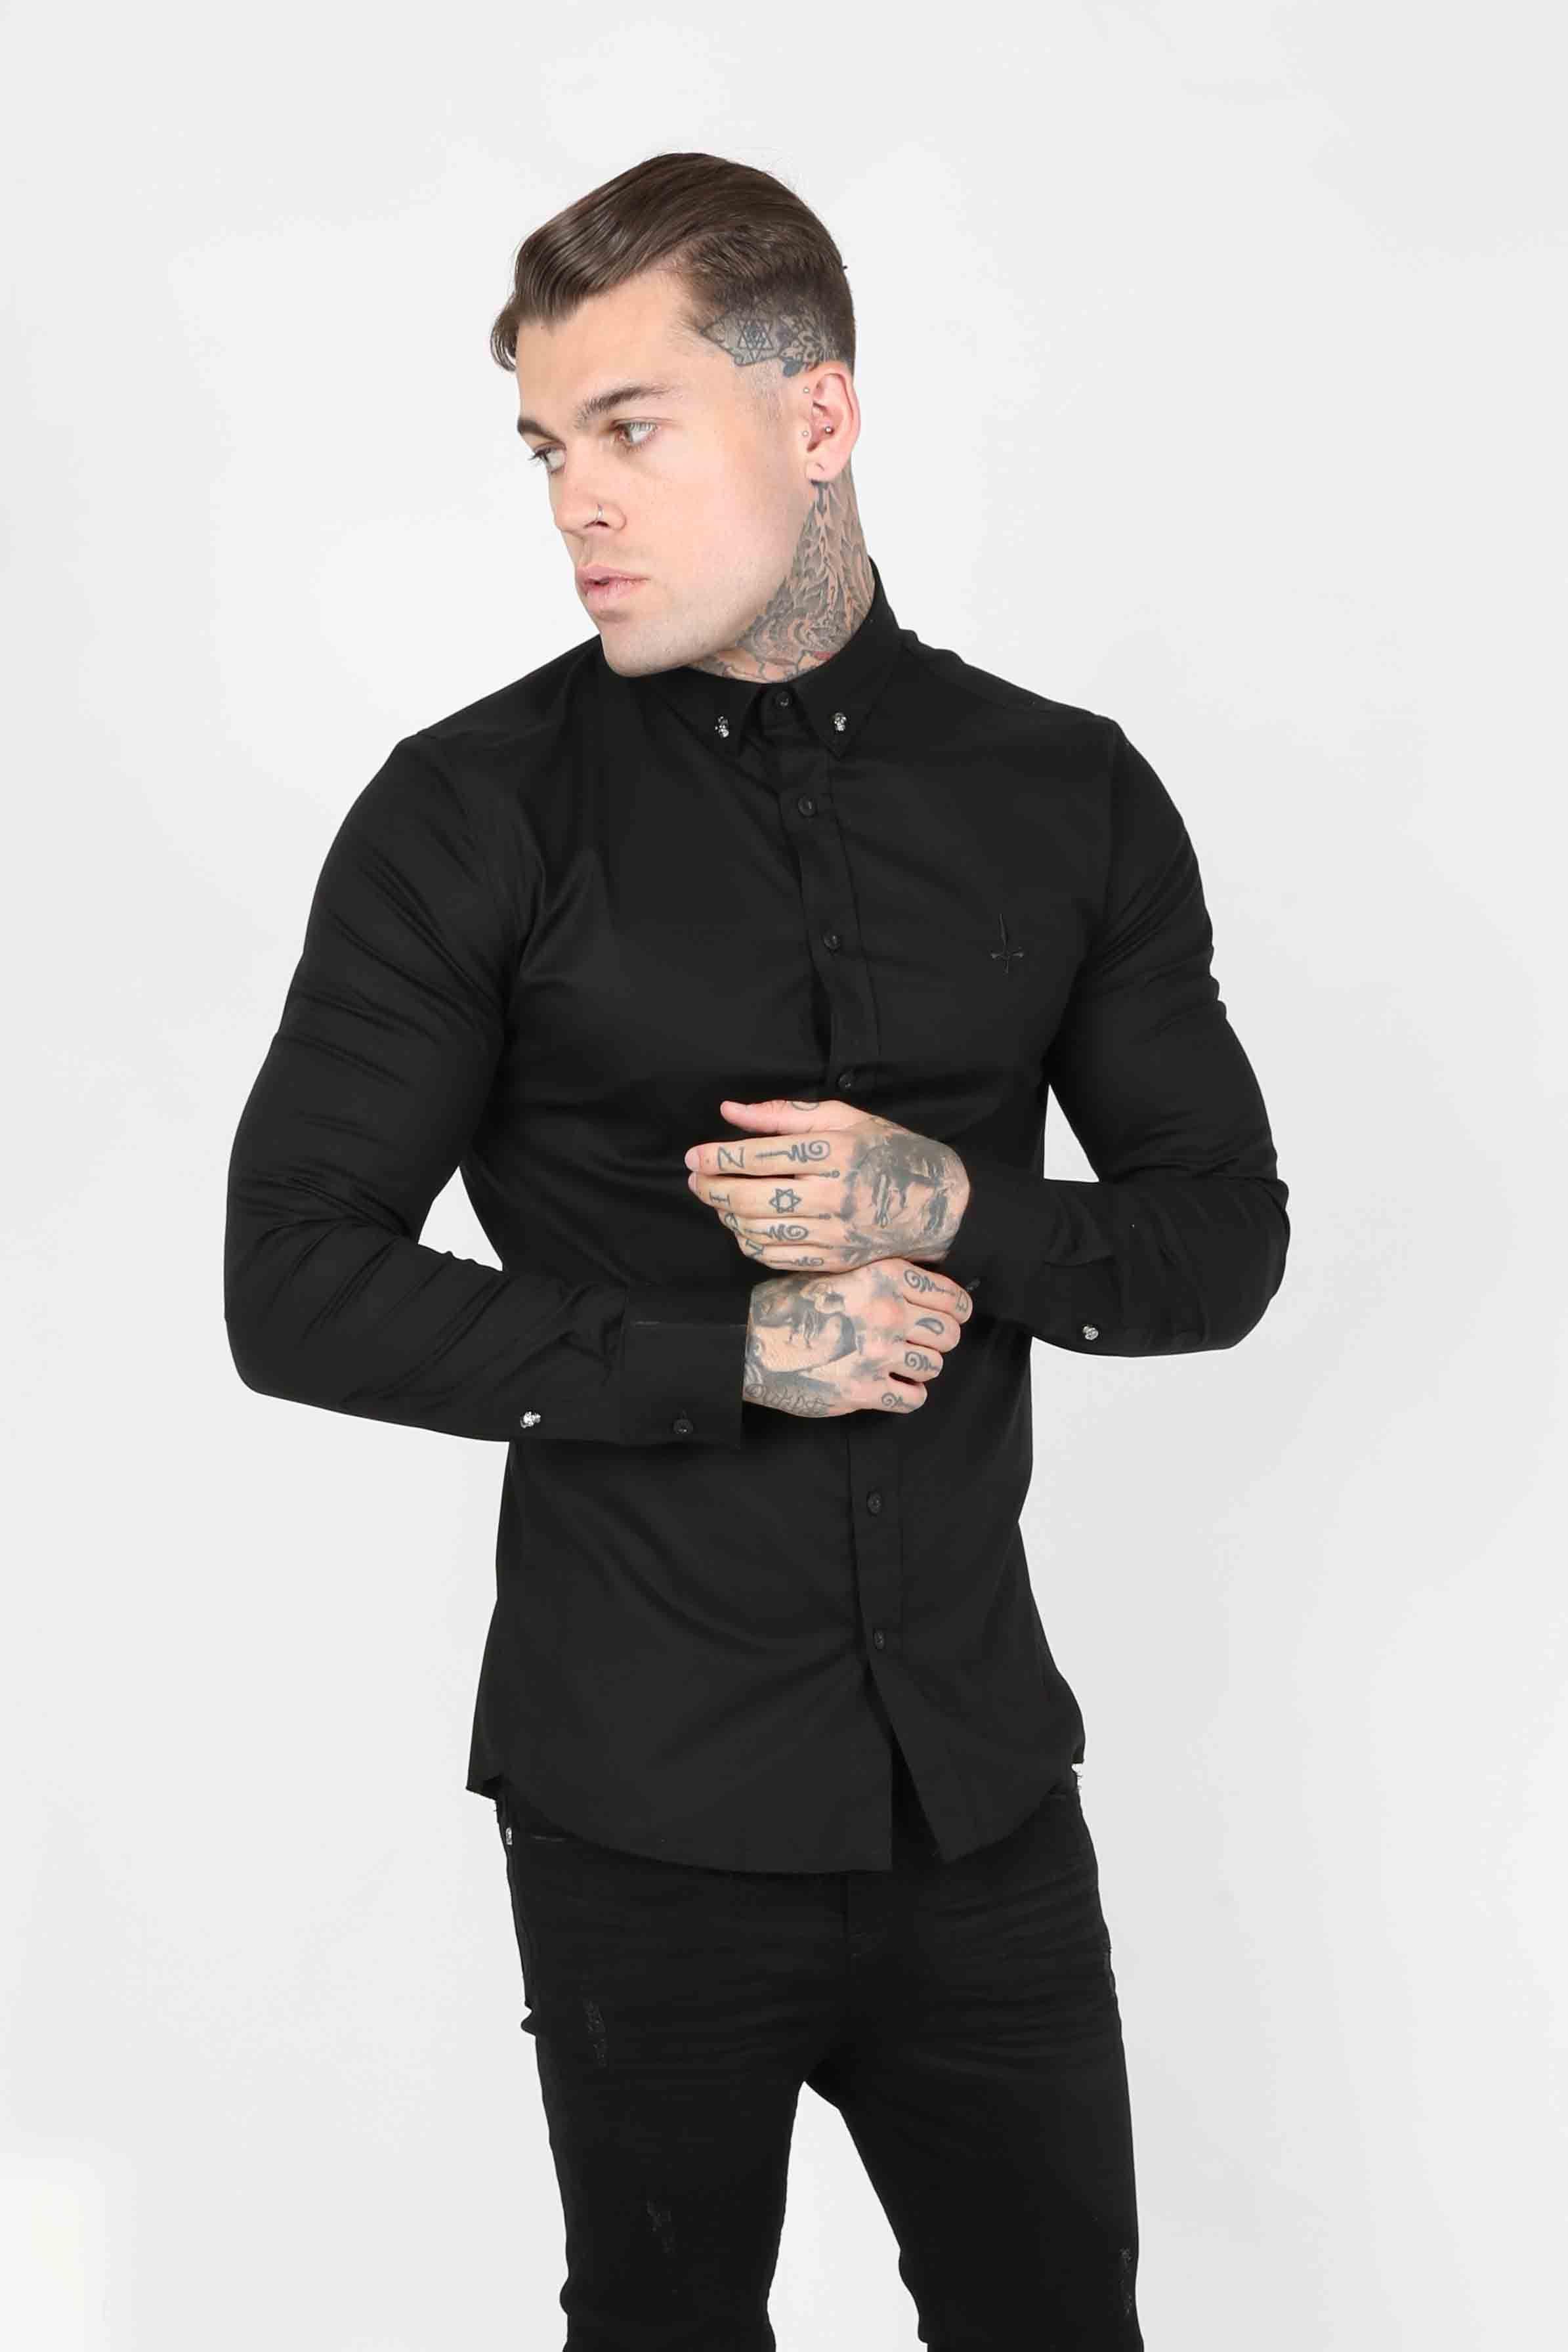 Smart Longsleeve Men's Shirt - Black, Small